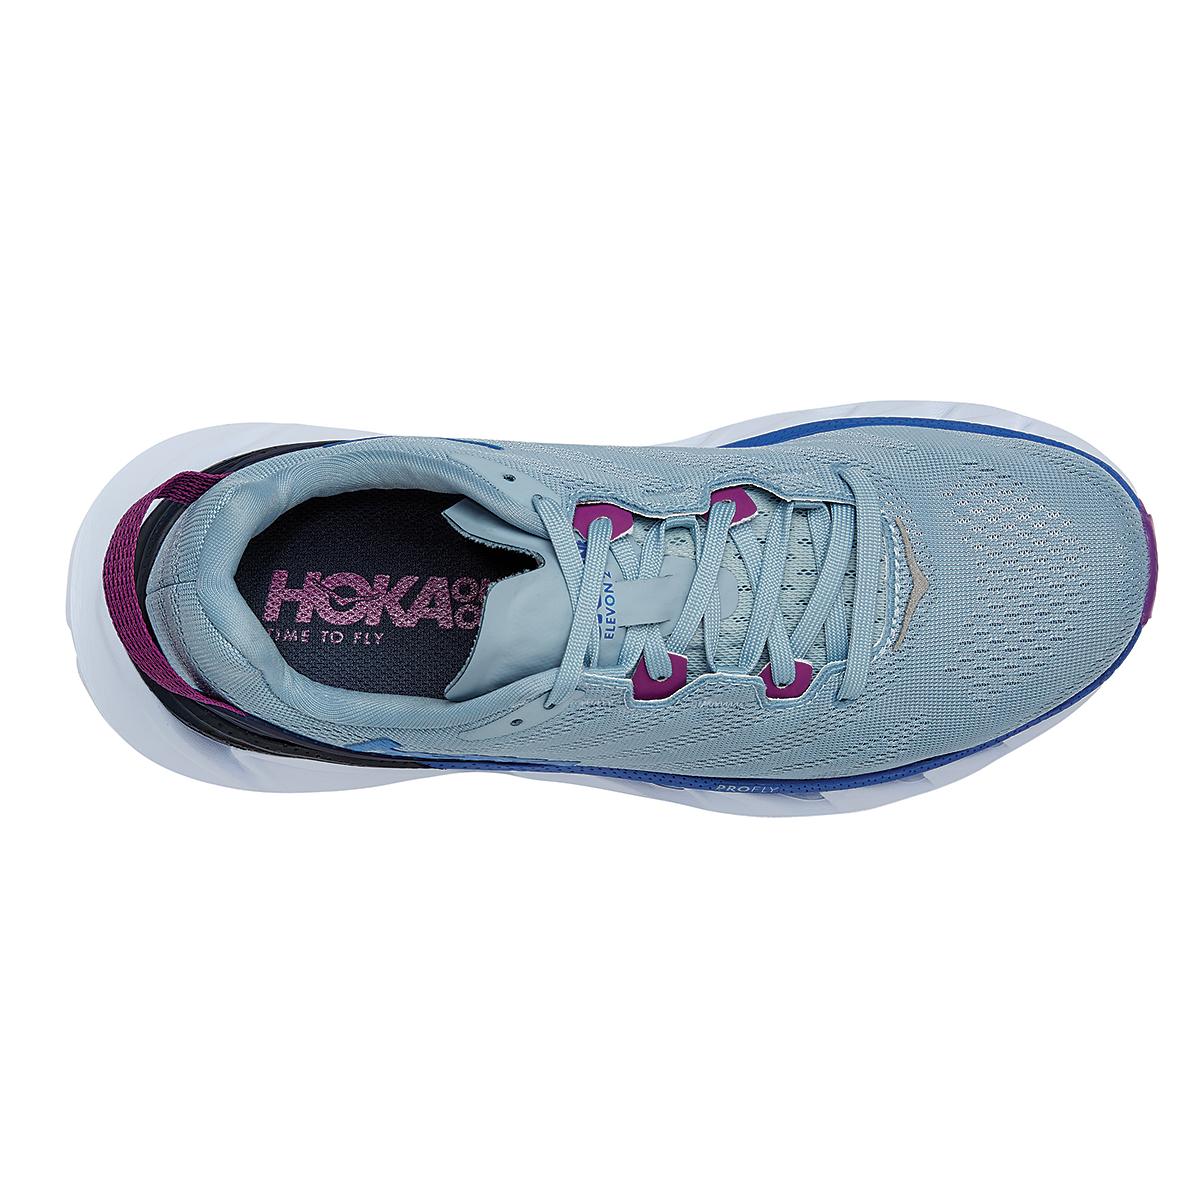 Women's Hoka One One Elevon 2 Running Shoe - Color: Ballad Blue - Size: 5 - Width: Regular, Ballad Blue, large, image 5